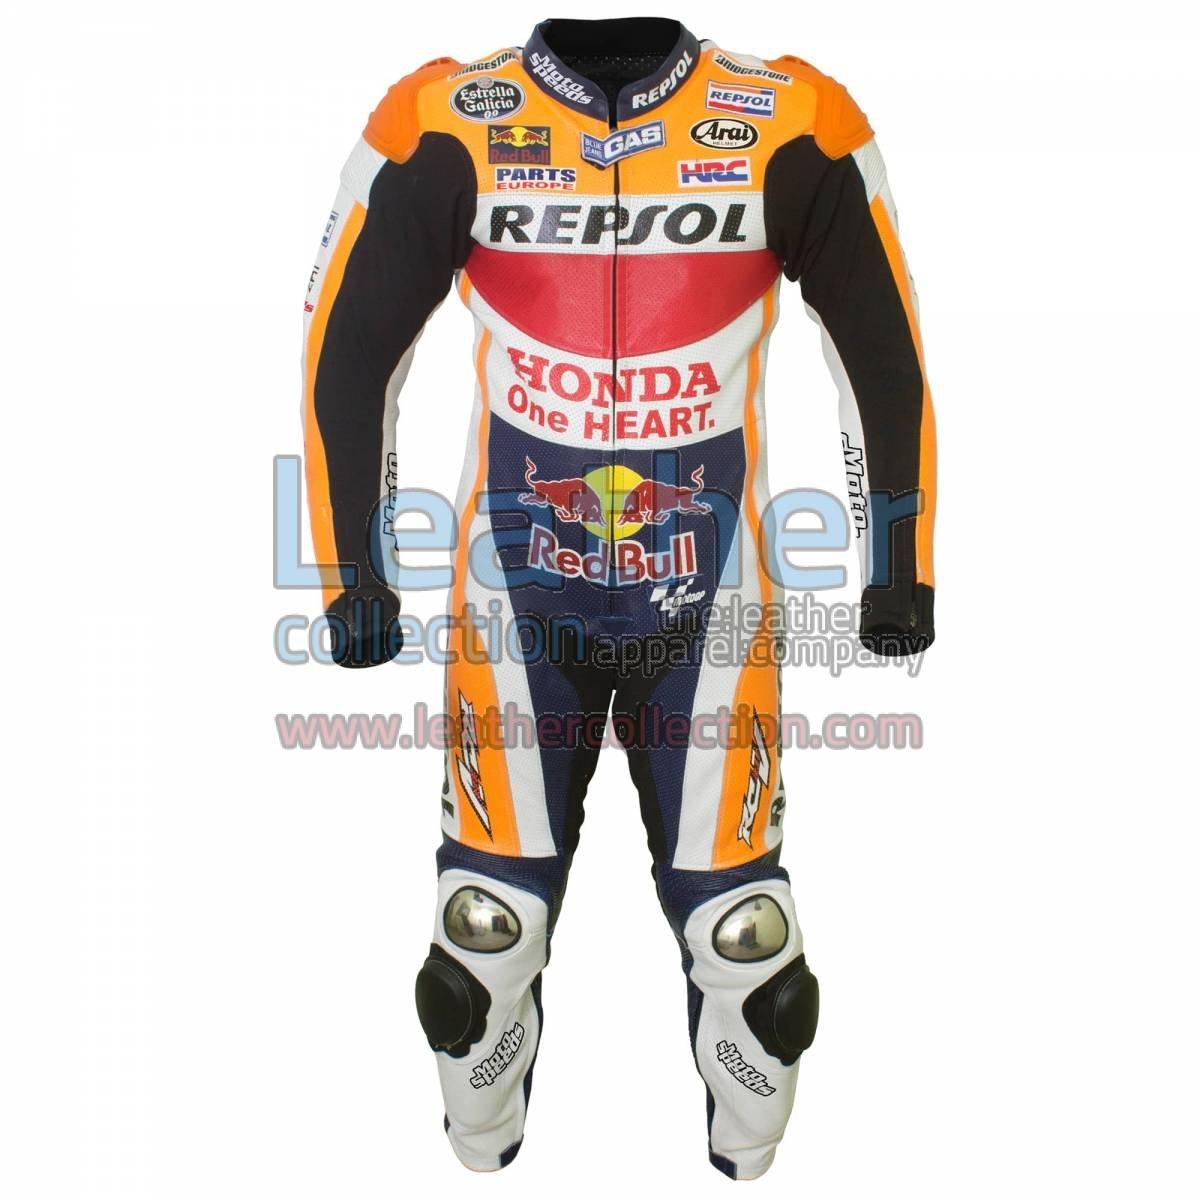 Dani Pedrosa Honda Repsol MotoGP 2015 Leathers